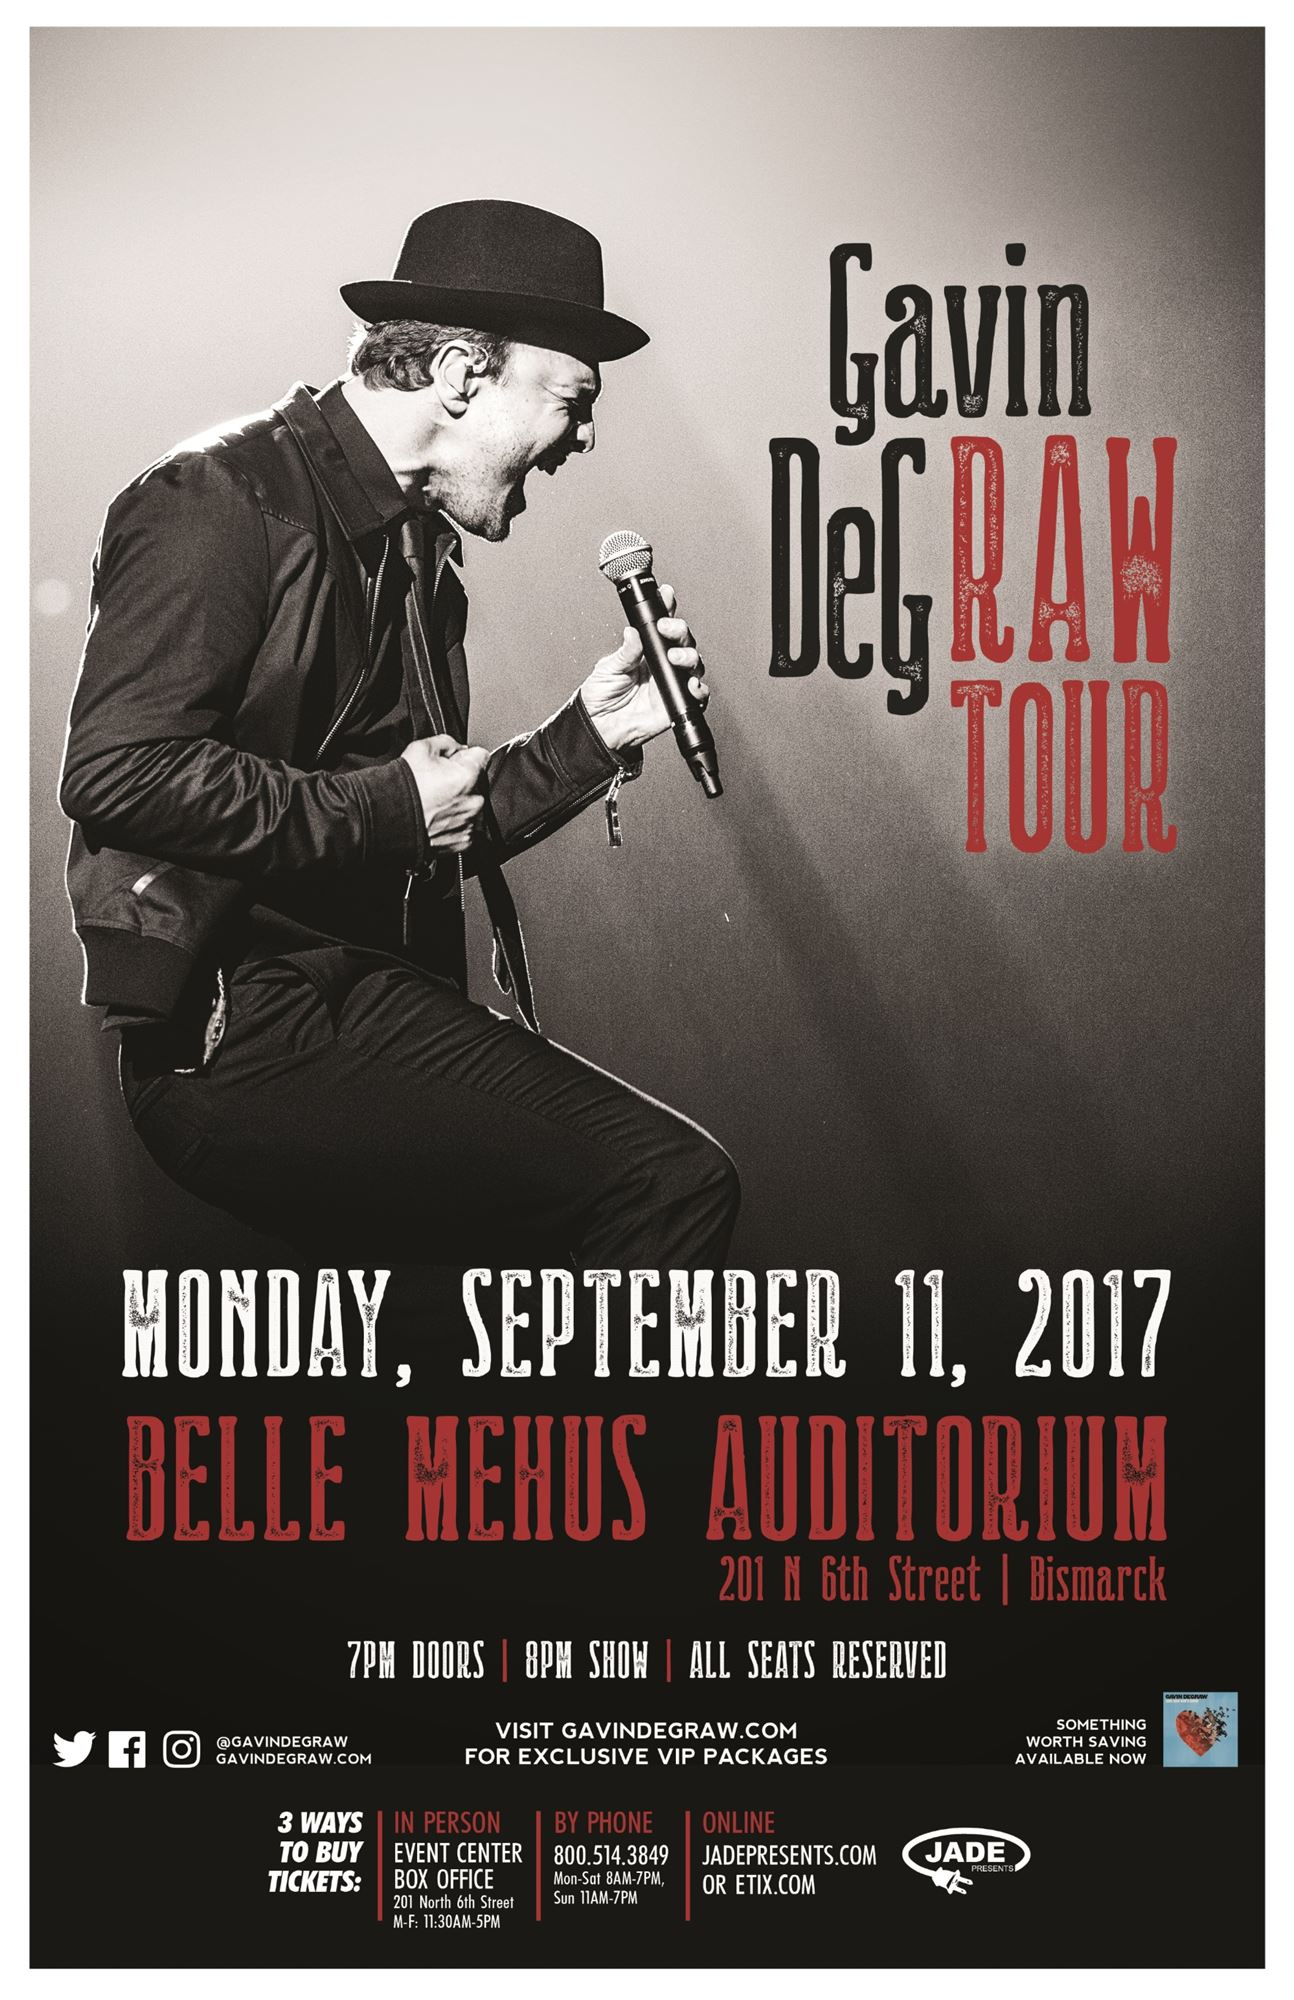 Gavin Degraw Gavin Degraw Tour